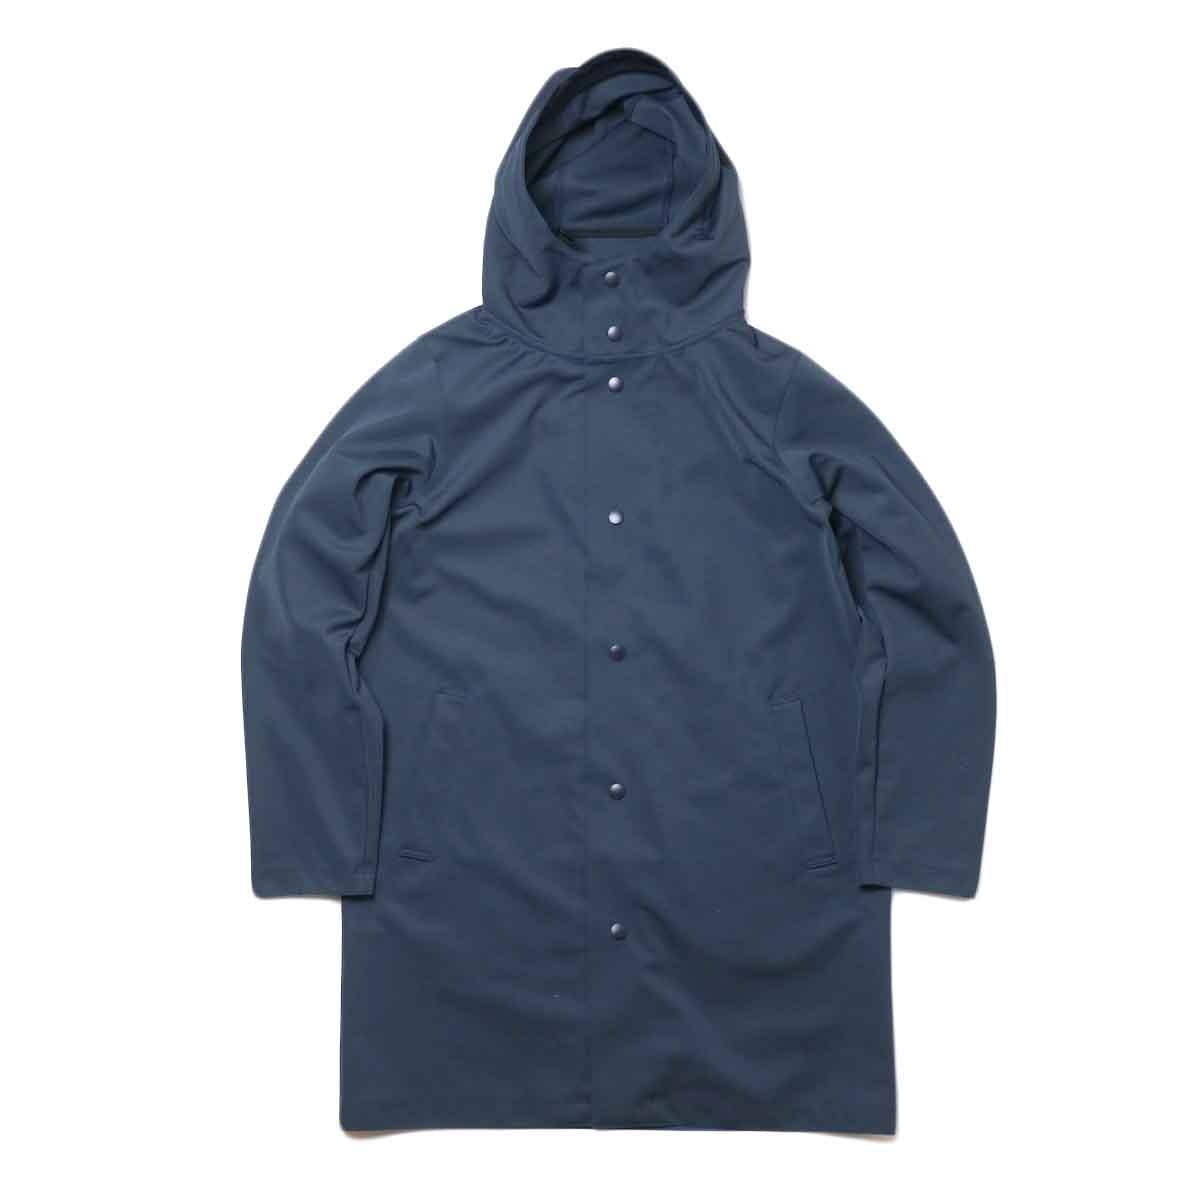 Jackman / High-density Jersey Coat (Navy)